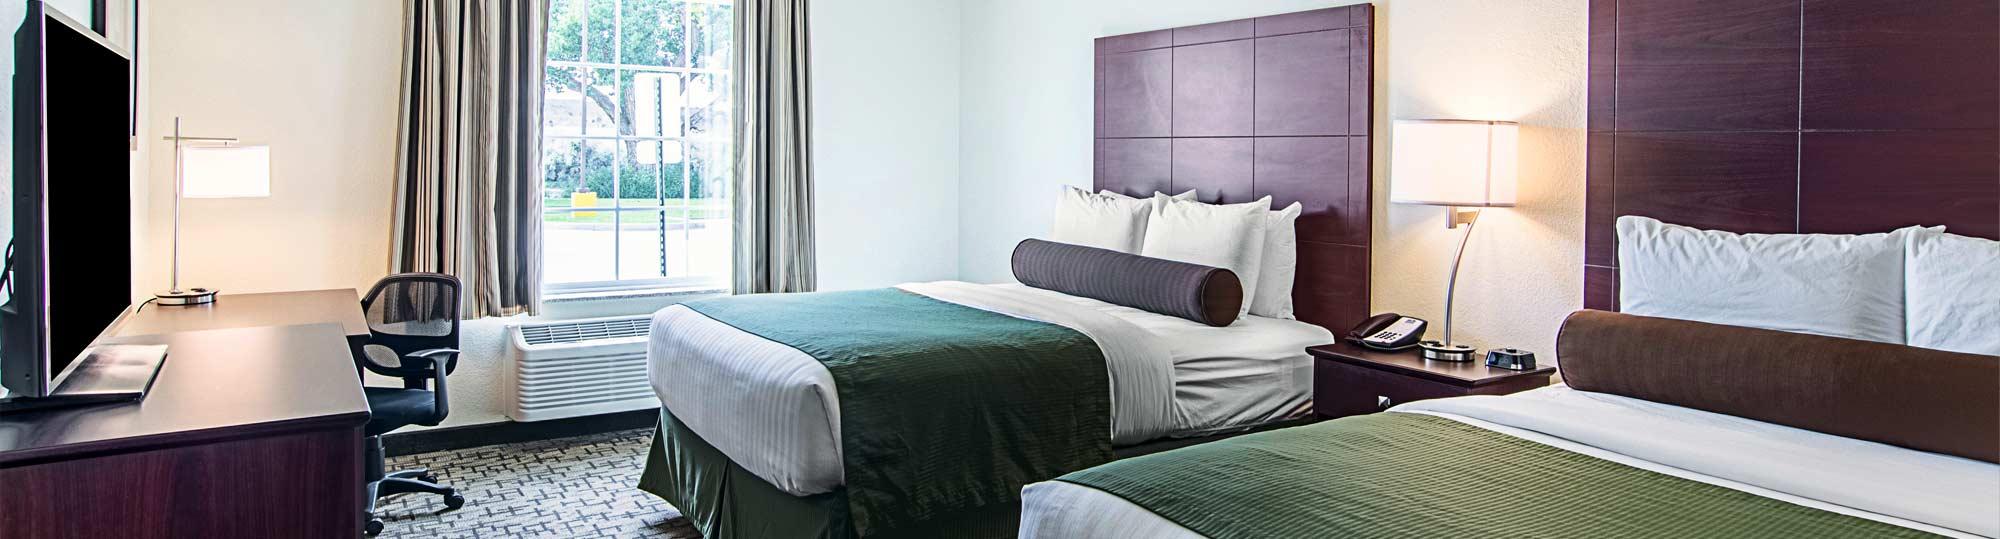 Cobblestone Inn & Suites Guernsey